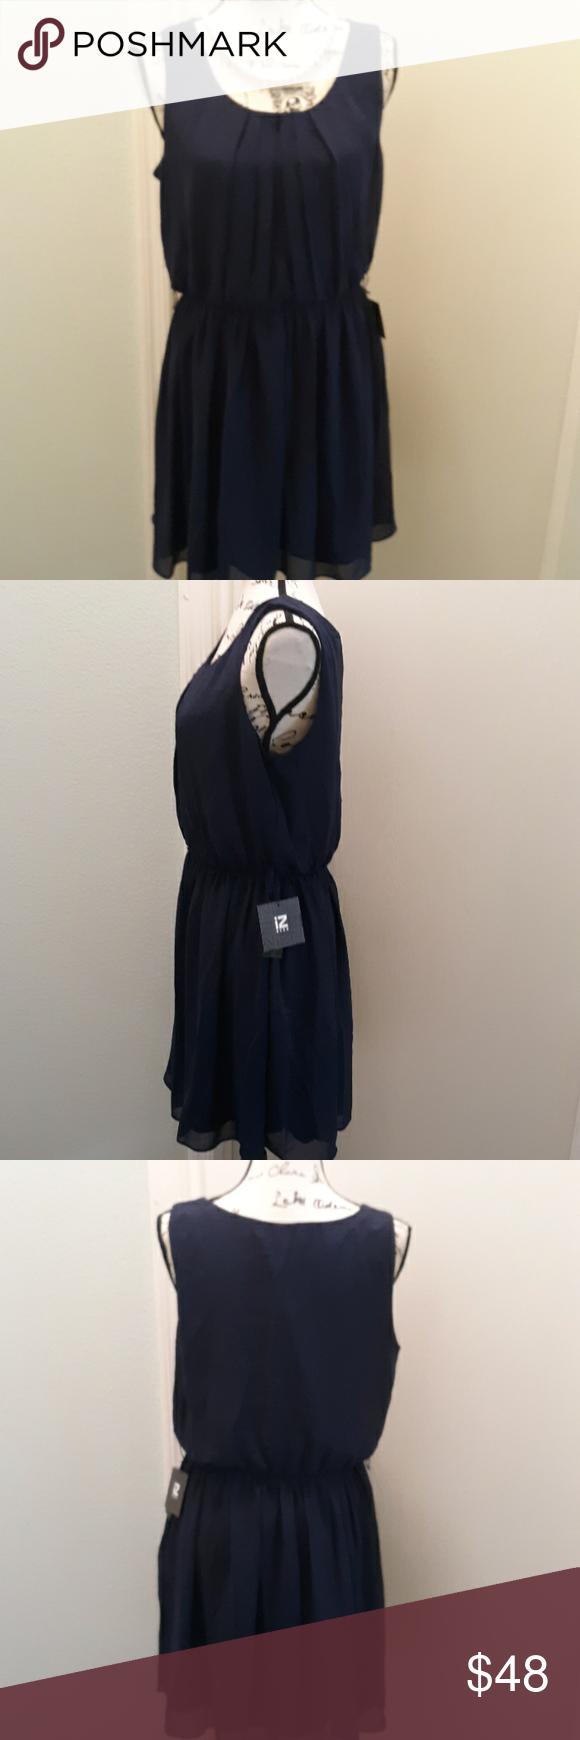 NWT Iz Byer Navy pleated dress size XL NWT Iz Byer Navy pleated dress size XL  Fully lined  100% polyester  Perfect for date night or girl's night out  *missing belt* B: 36-44 W: 38-38 H: 40-48 L: 34  #datenight #girlsnightout #whyiposh  #0502 Iz Byer Dresses